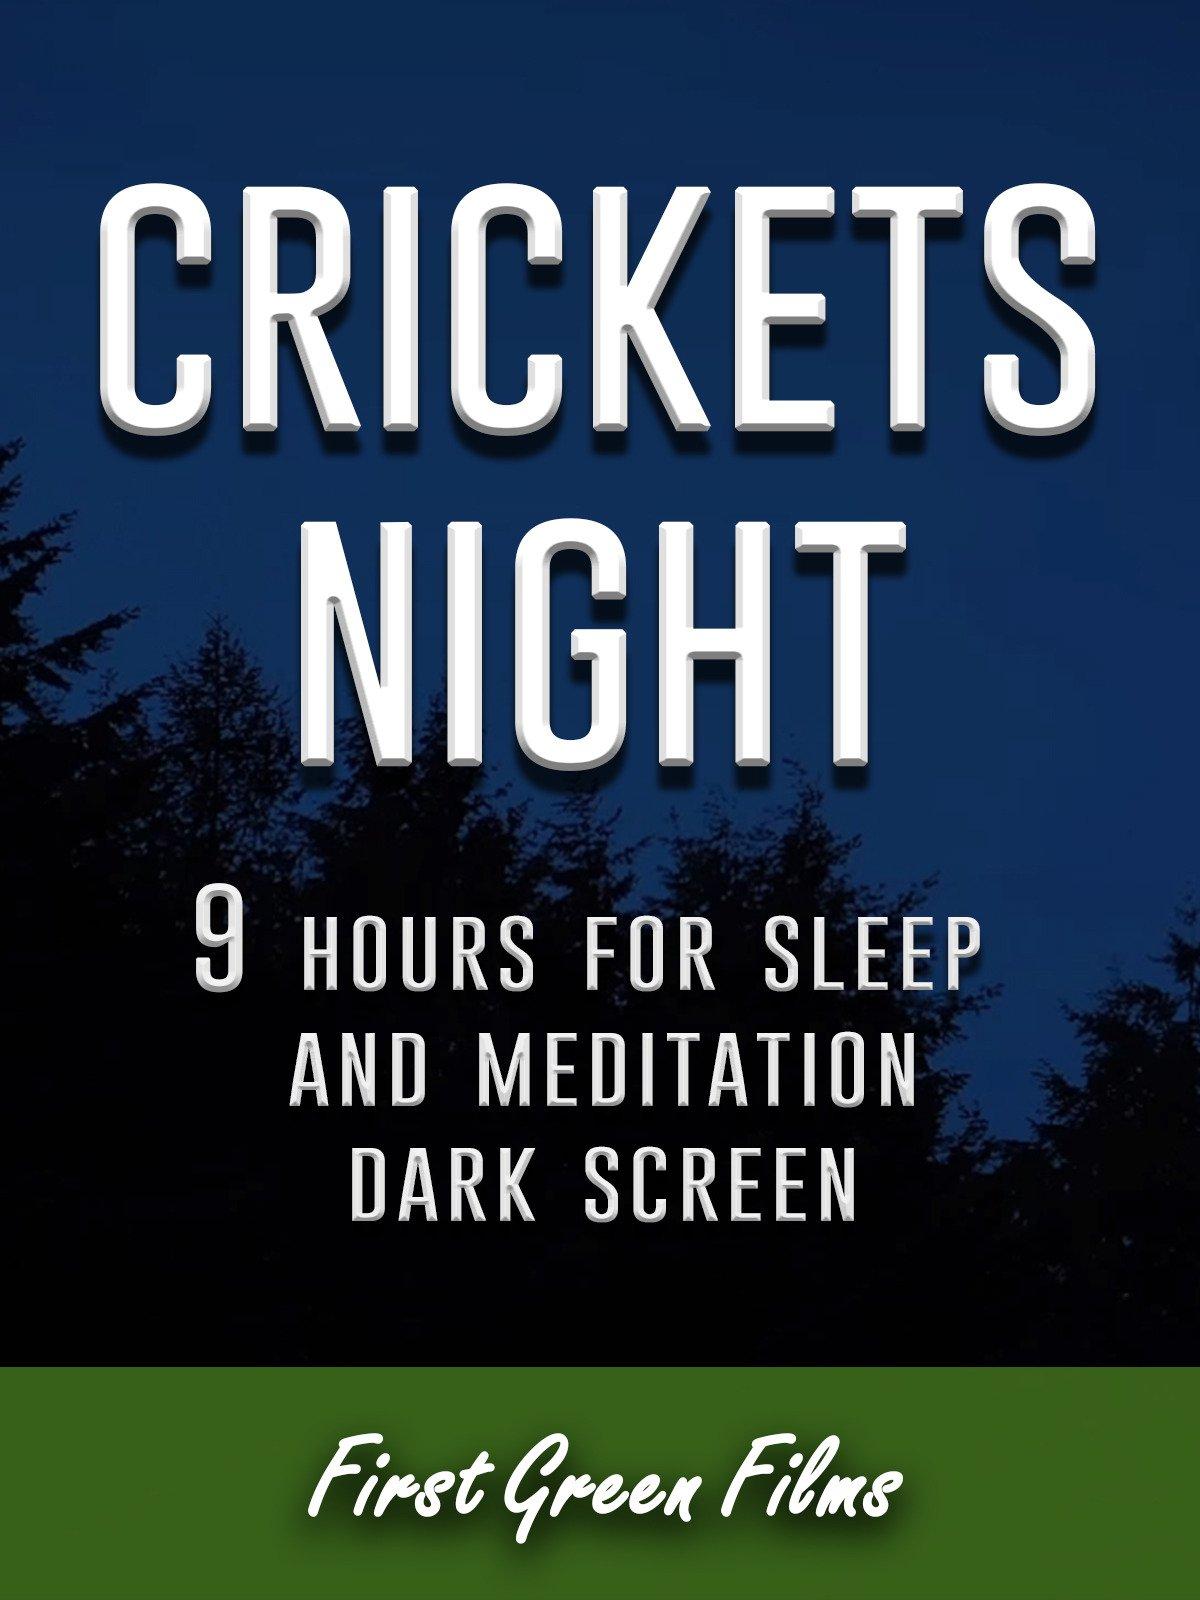 Crickets night, 9 hours for Sleep and Meditation, dark screen